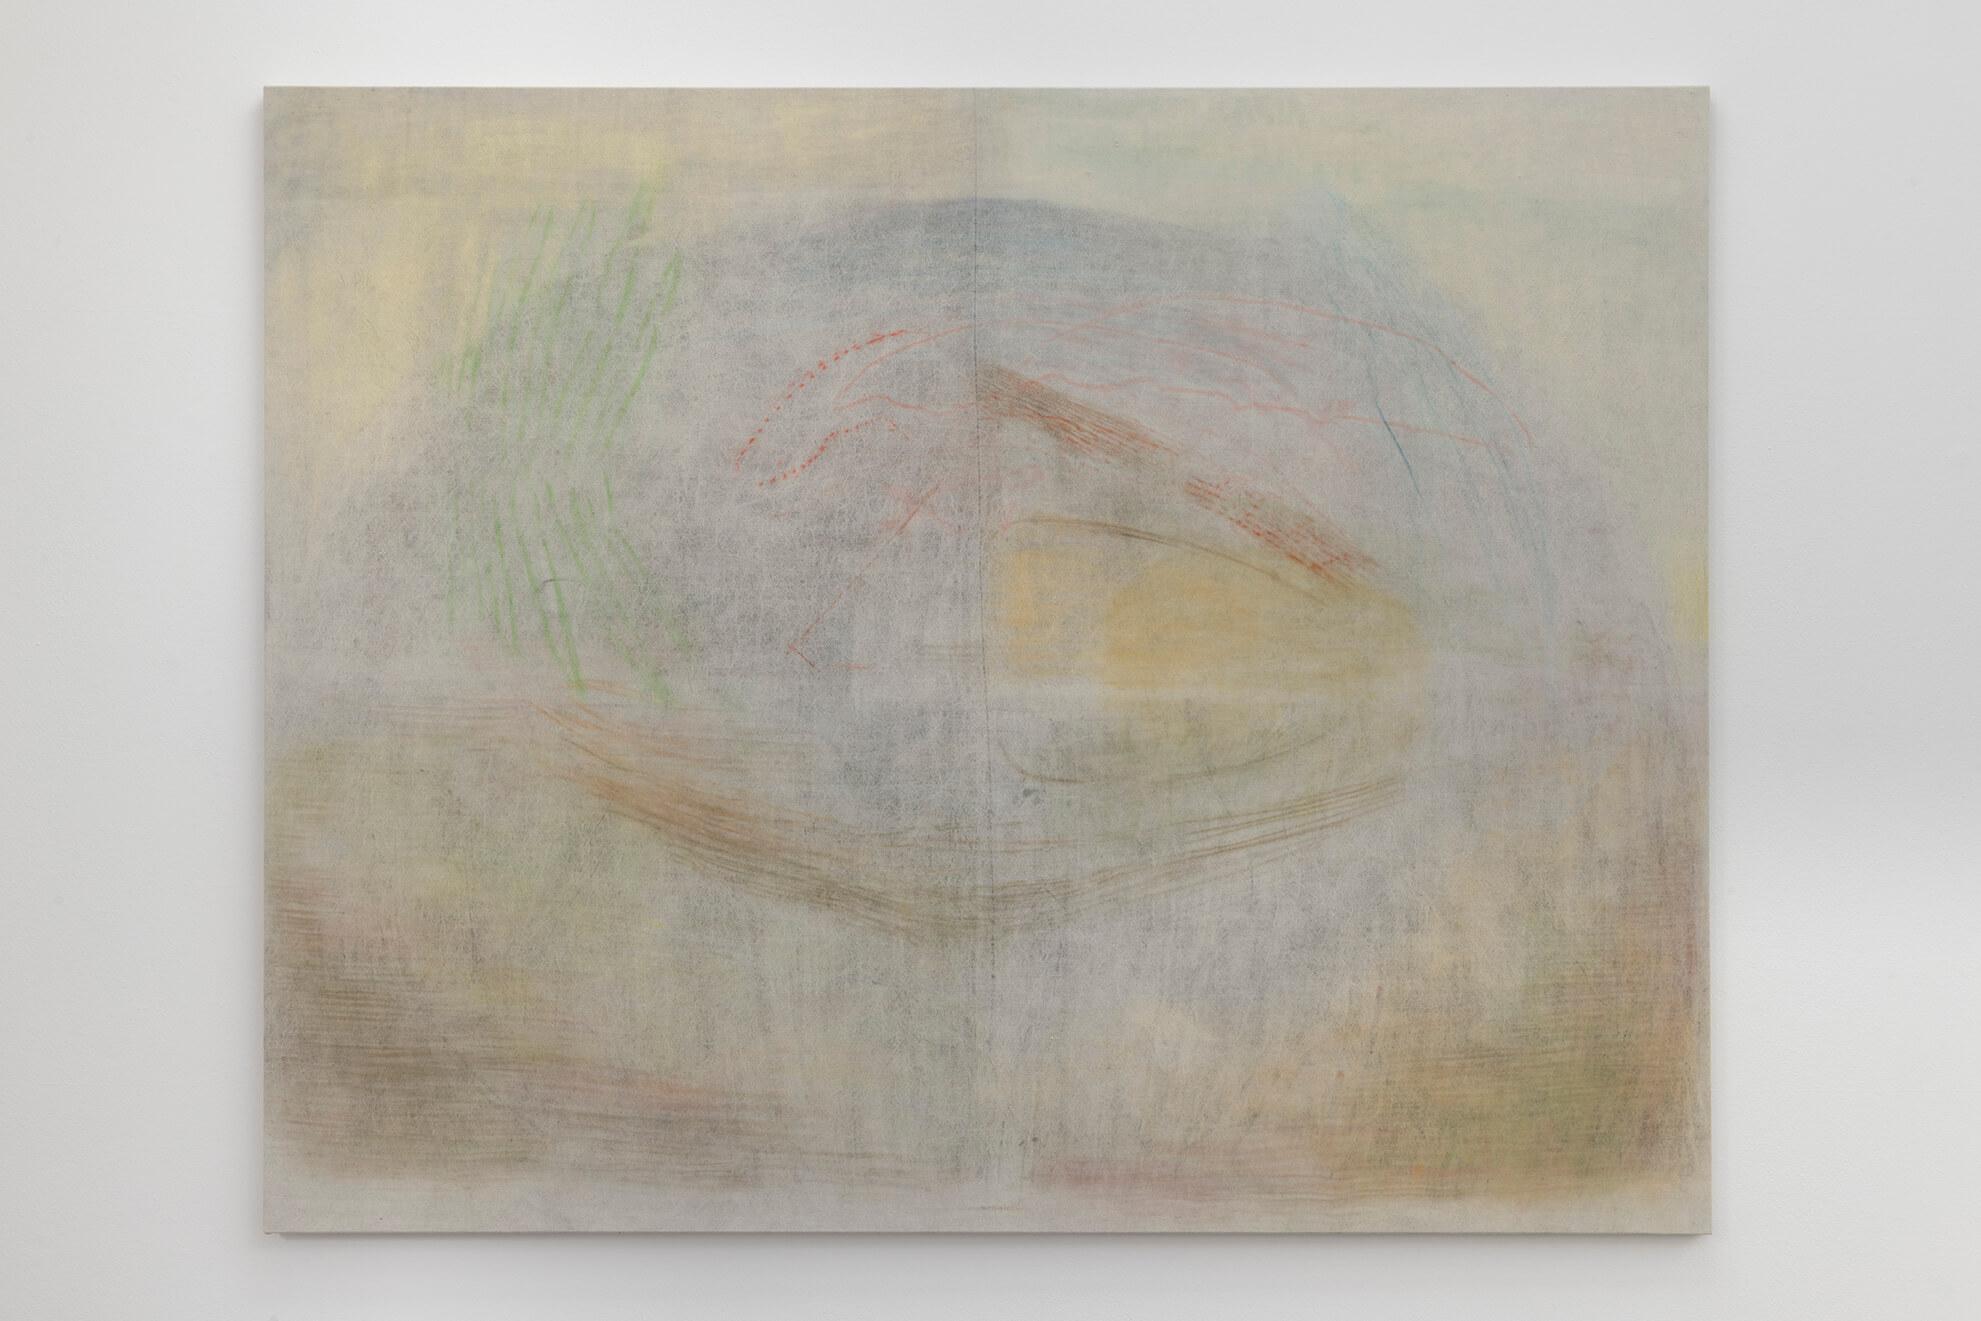 Passage, 2019 | Hollow | ProjecteSD